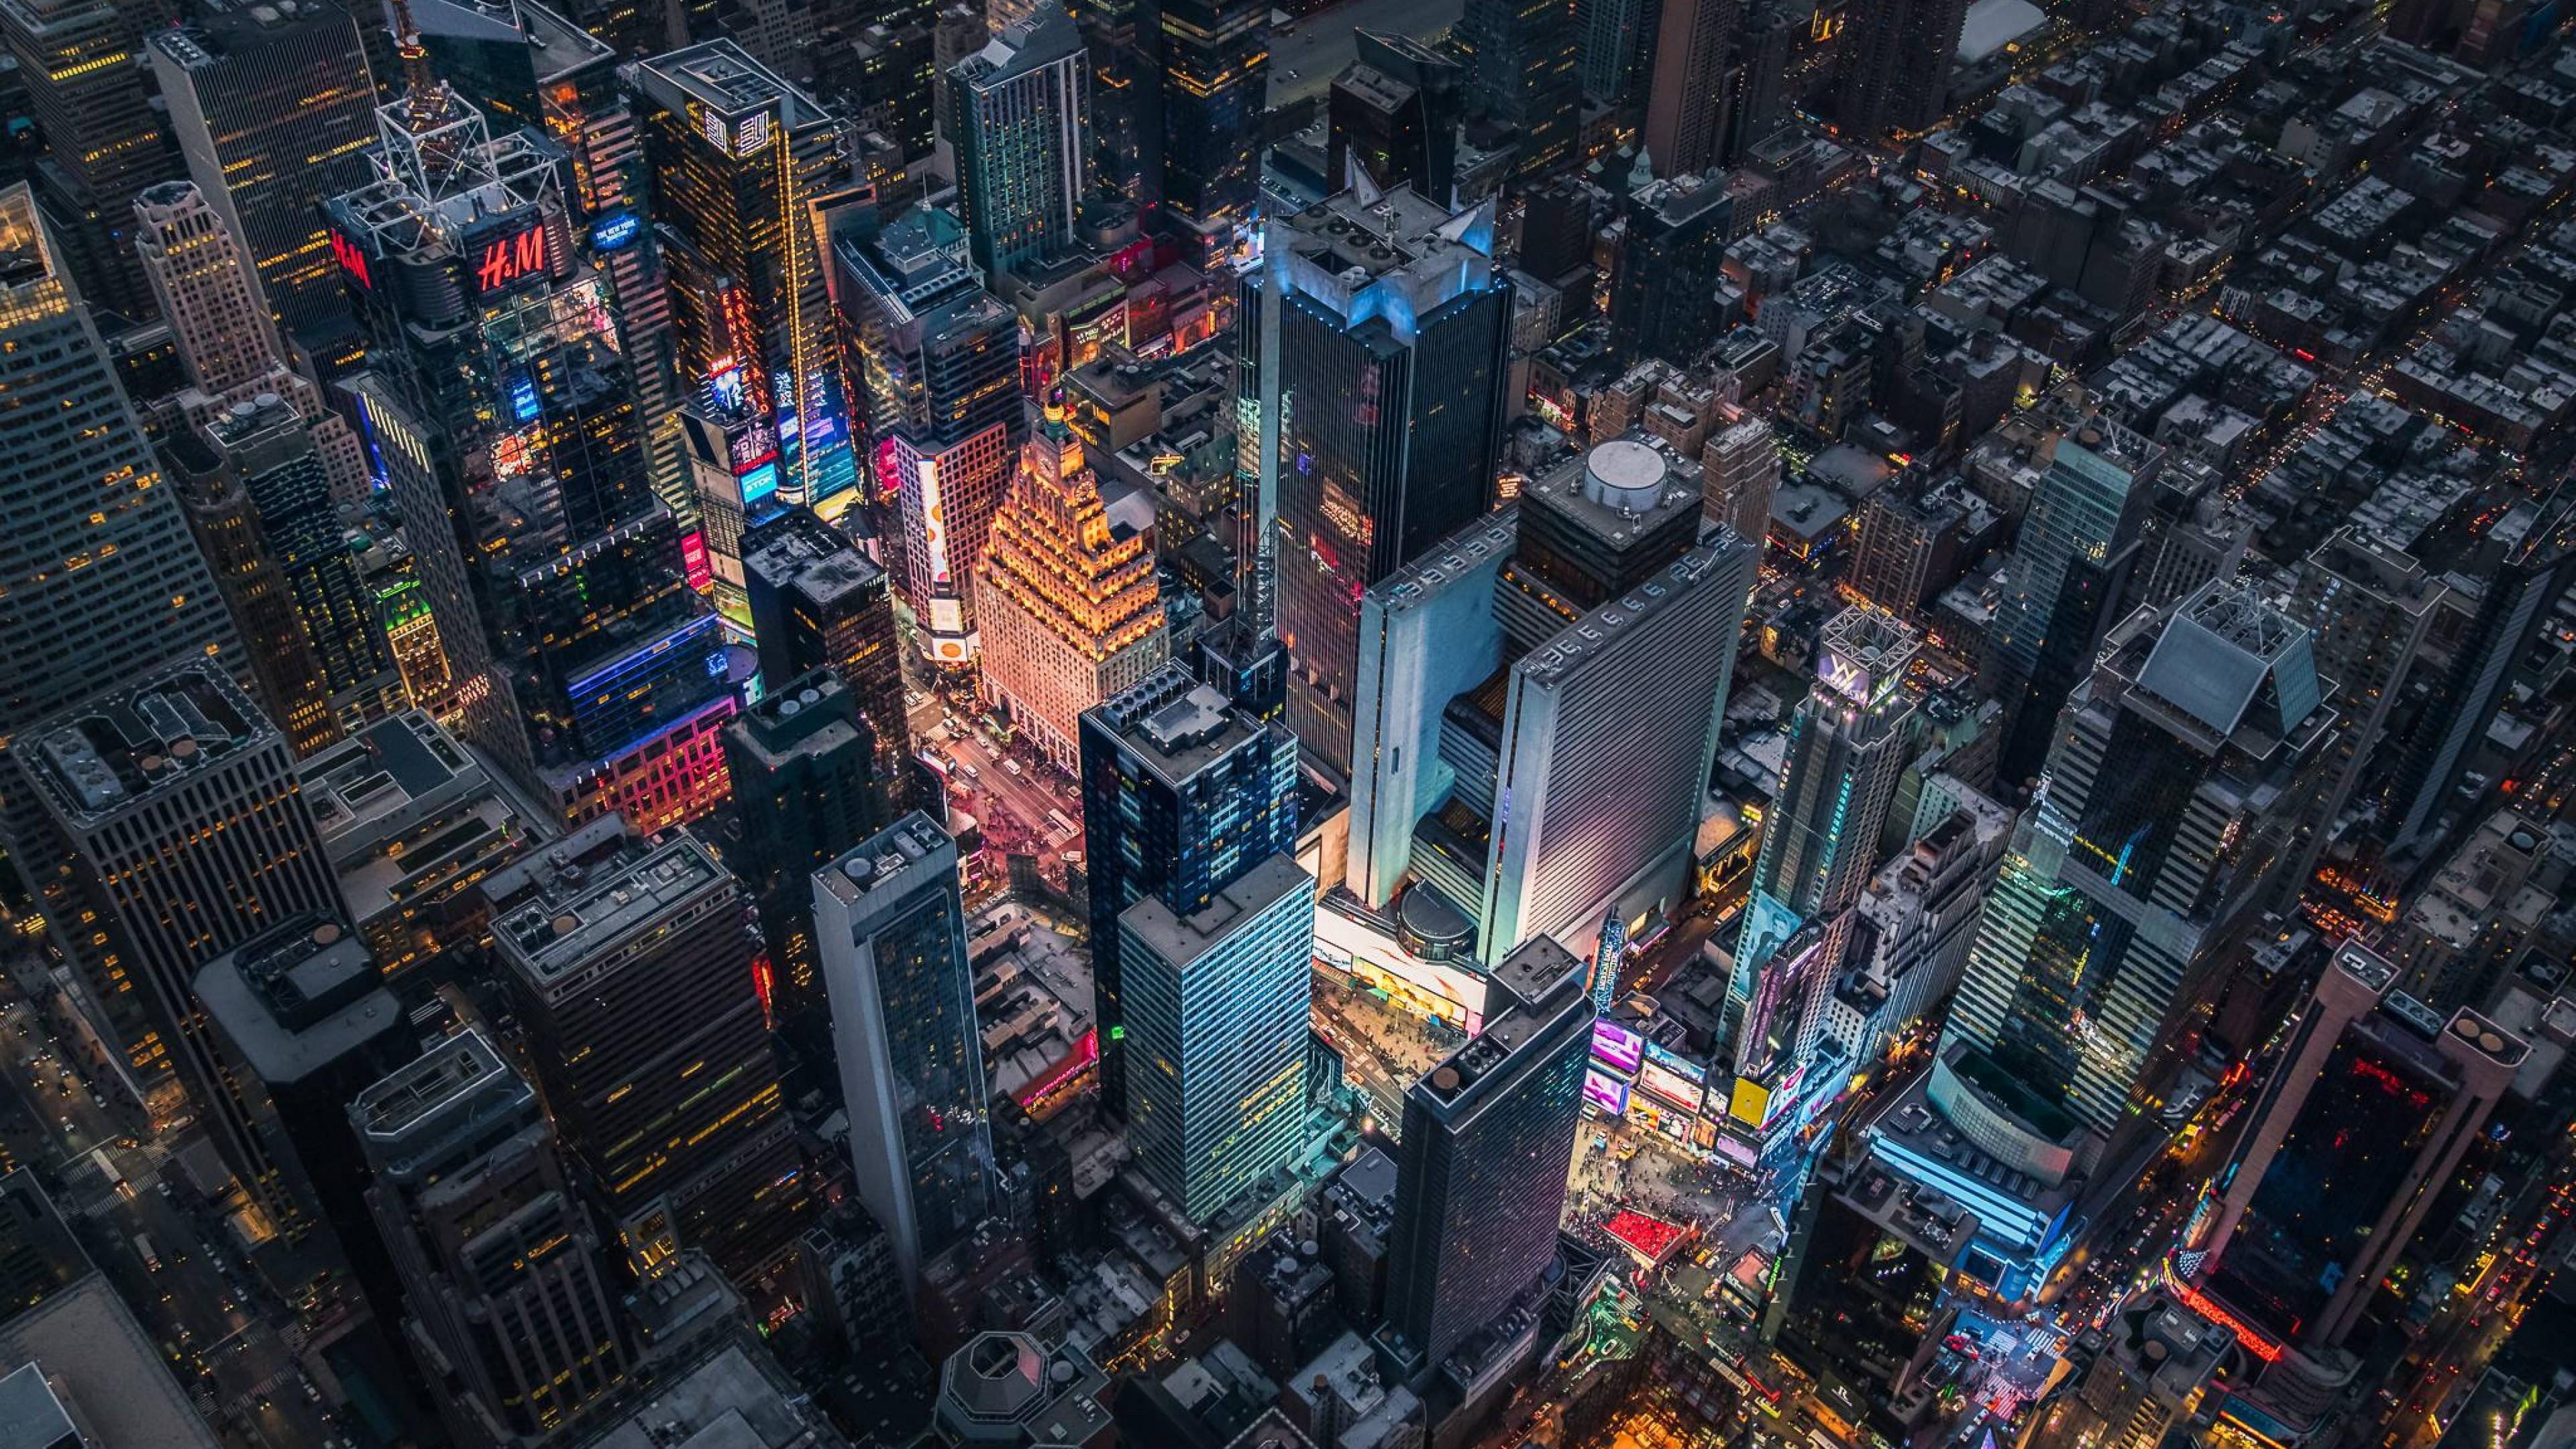 Times Square Birds Eye View Full Hd Wallpaper 4k Ultra Hd Hd Wallpaper Wallpapers Net